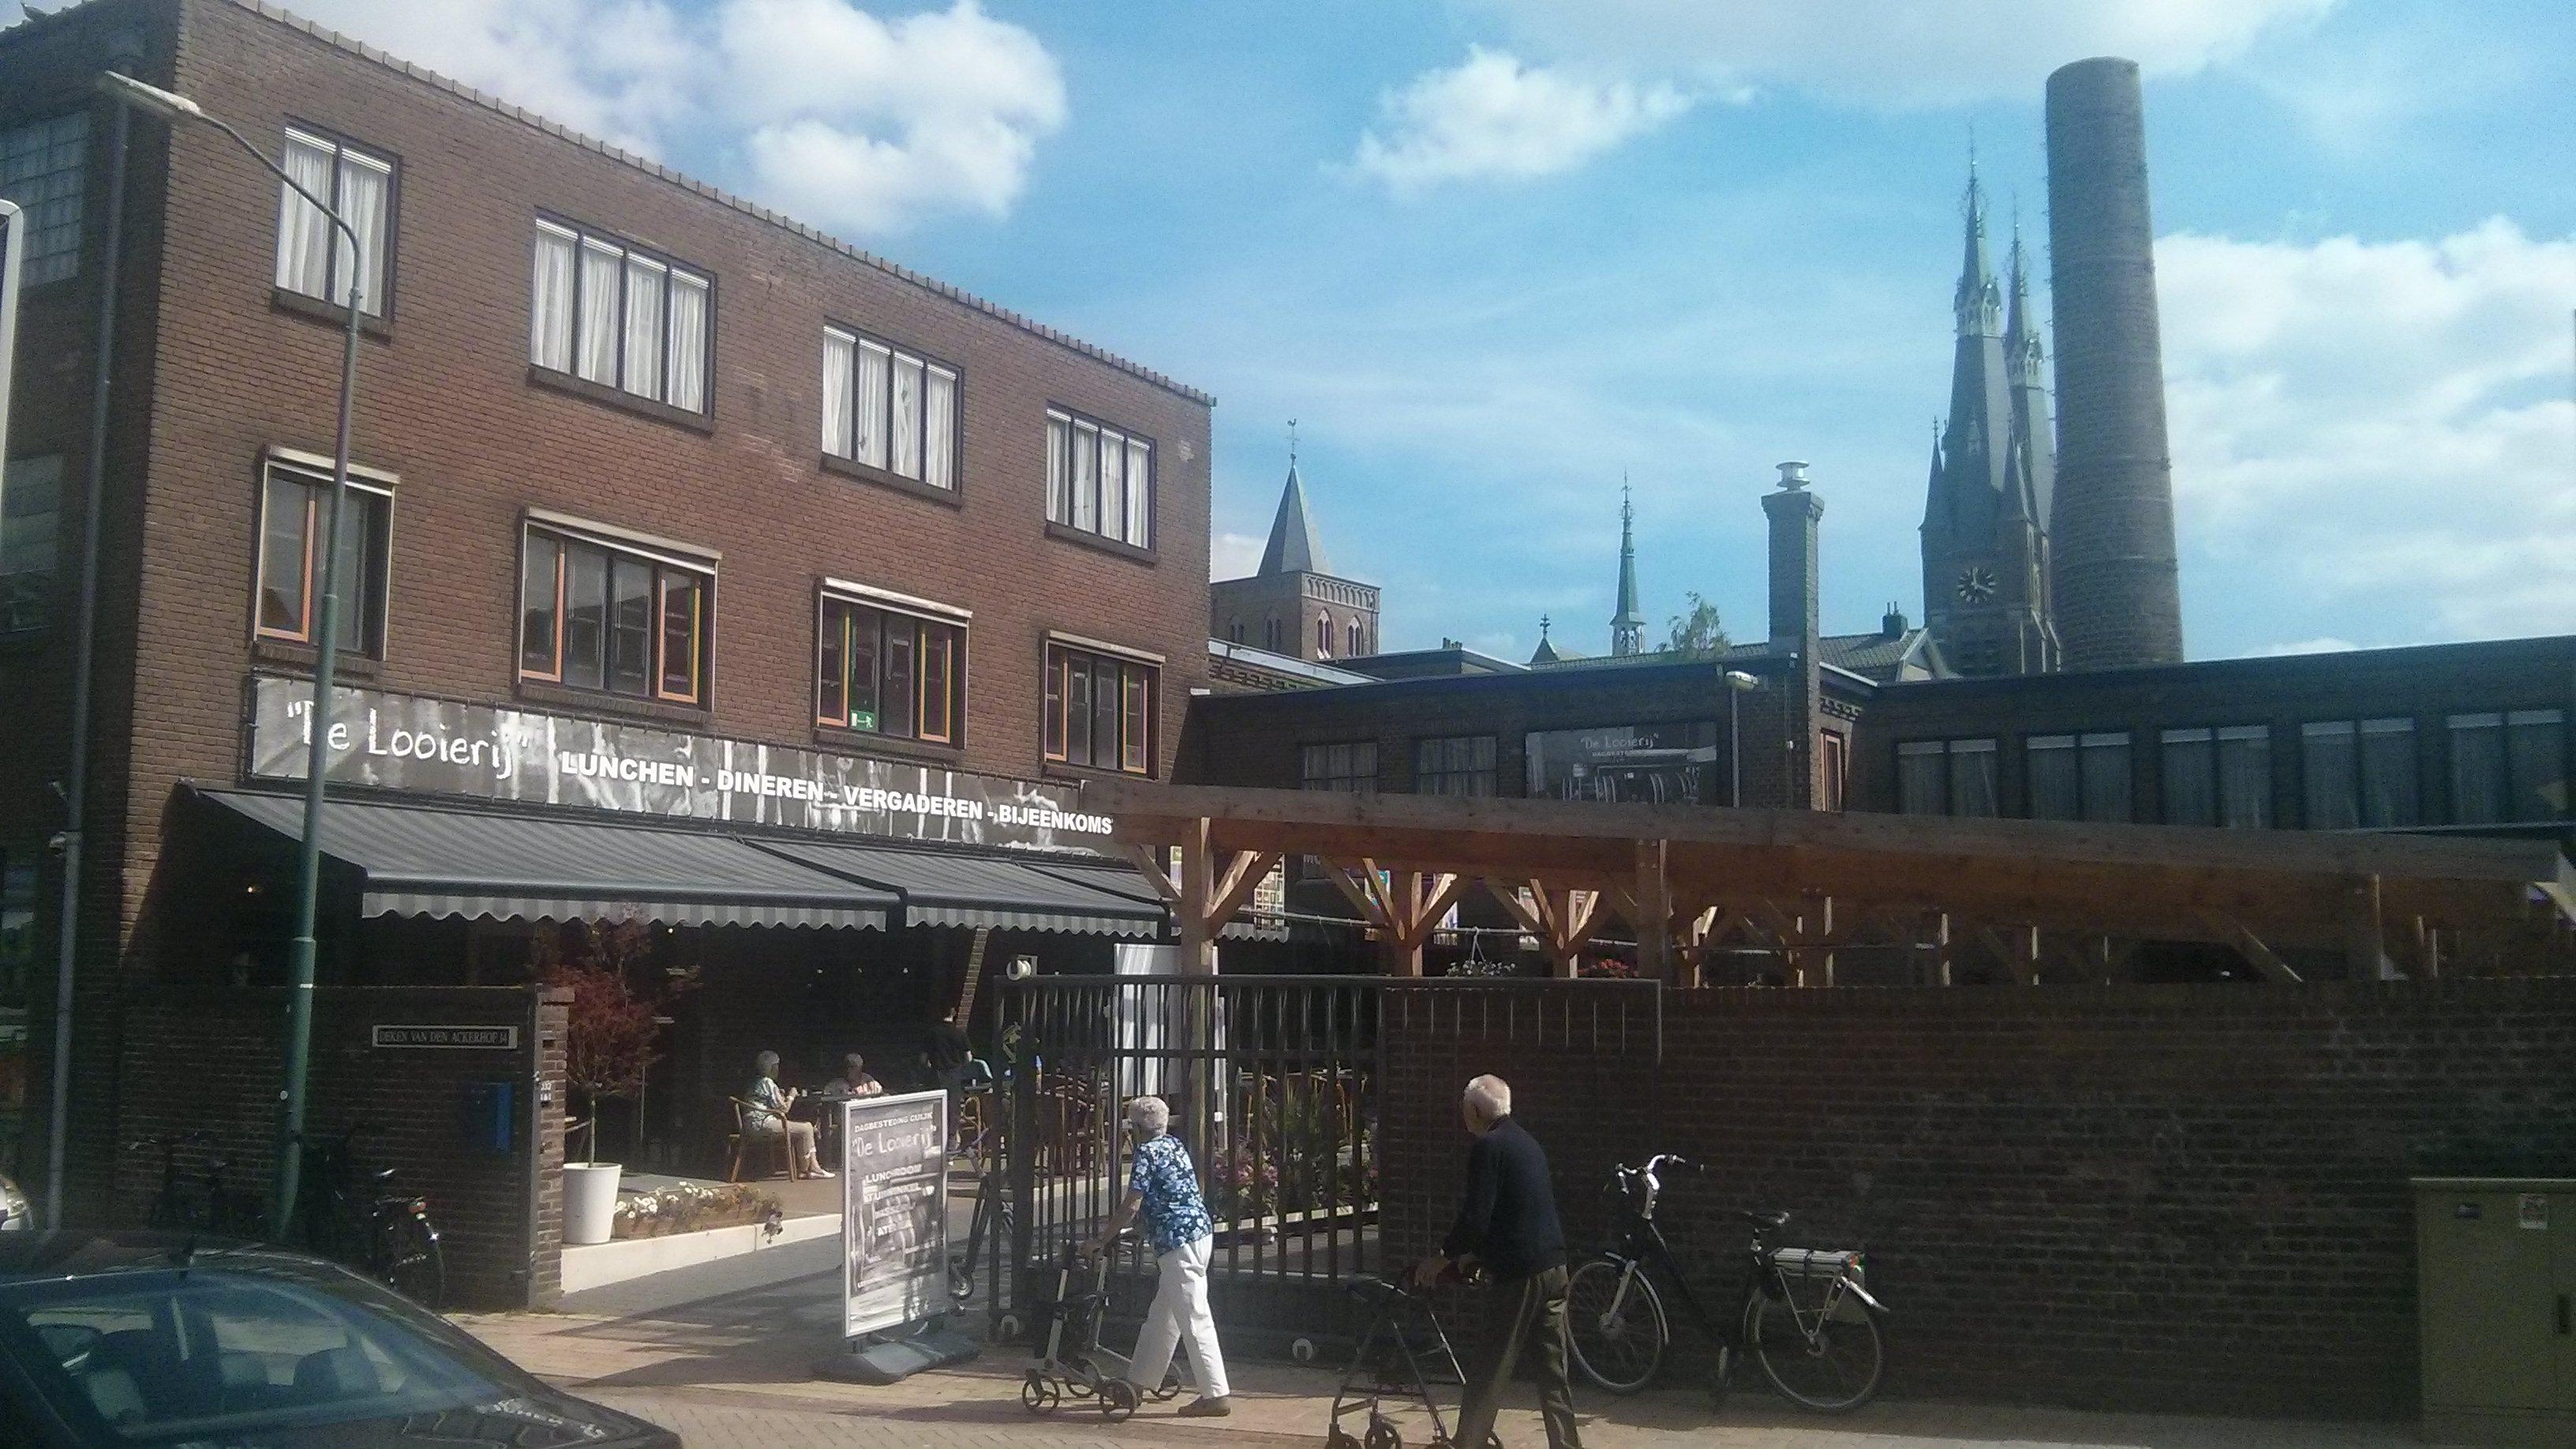 Niederlande 2017  Stefan Hocks Blog